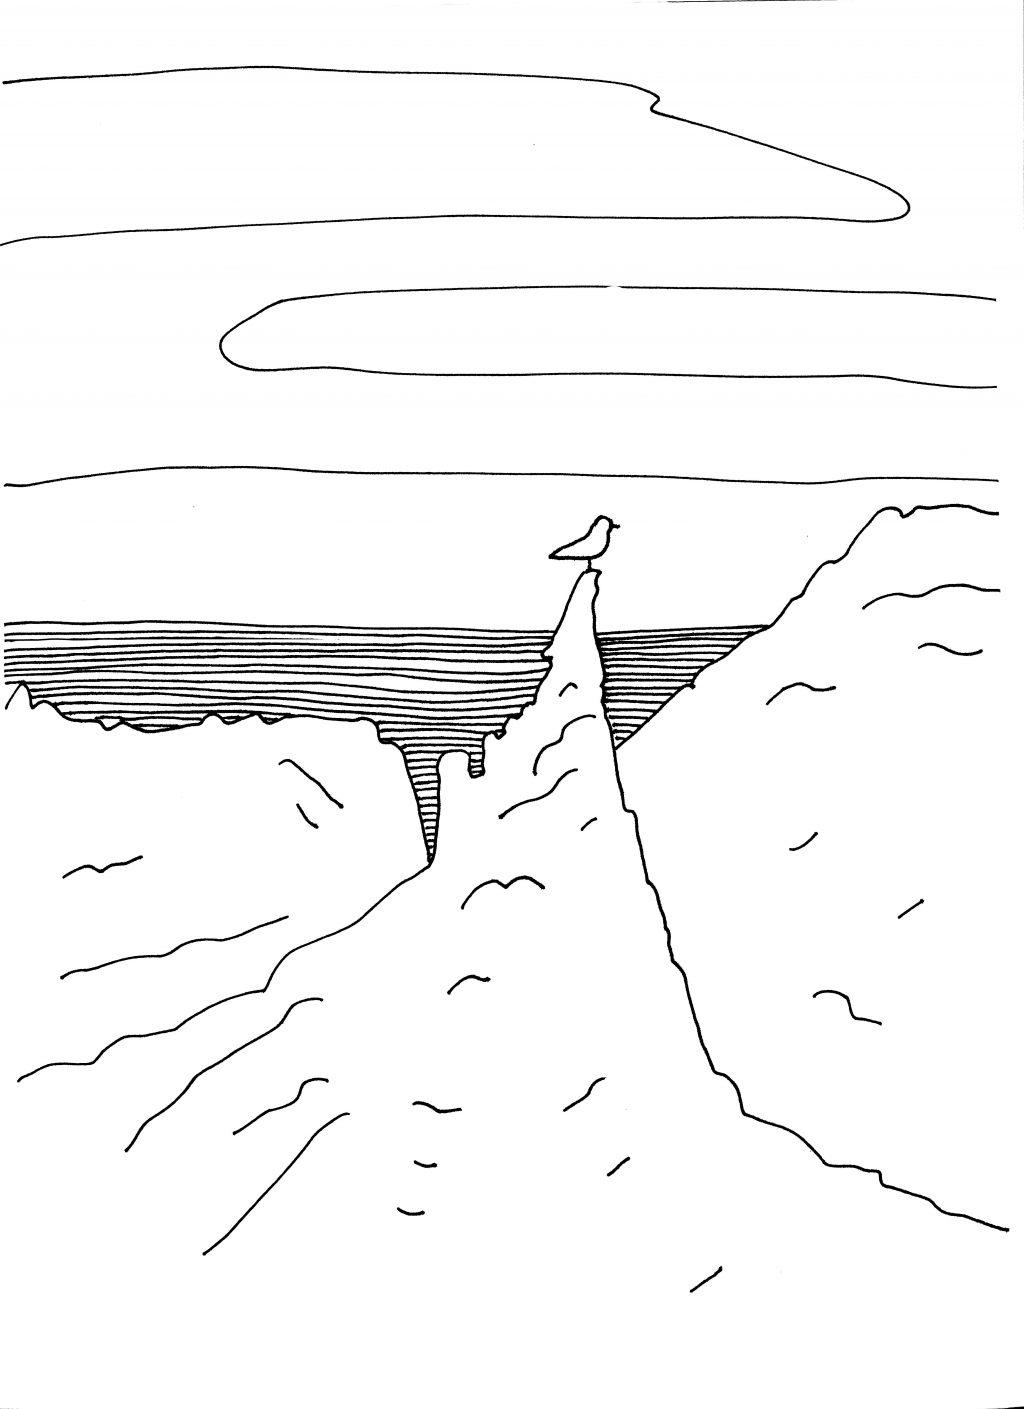 Beinahe Alaska Illustration von Arezu Weitholz